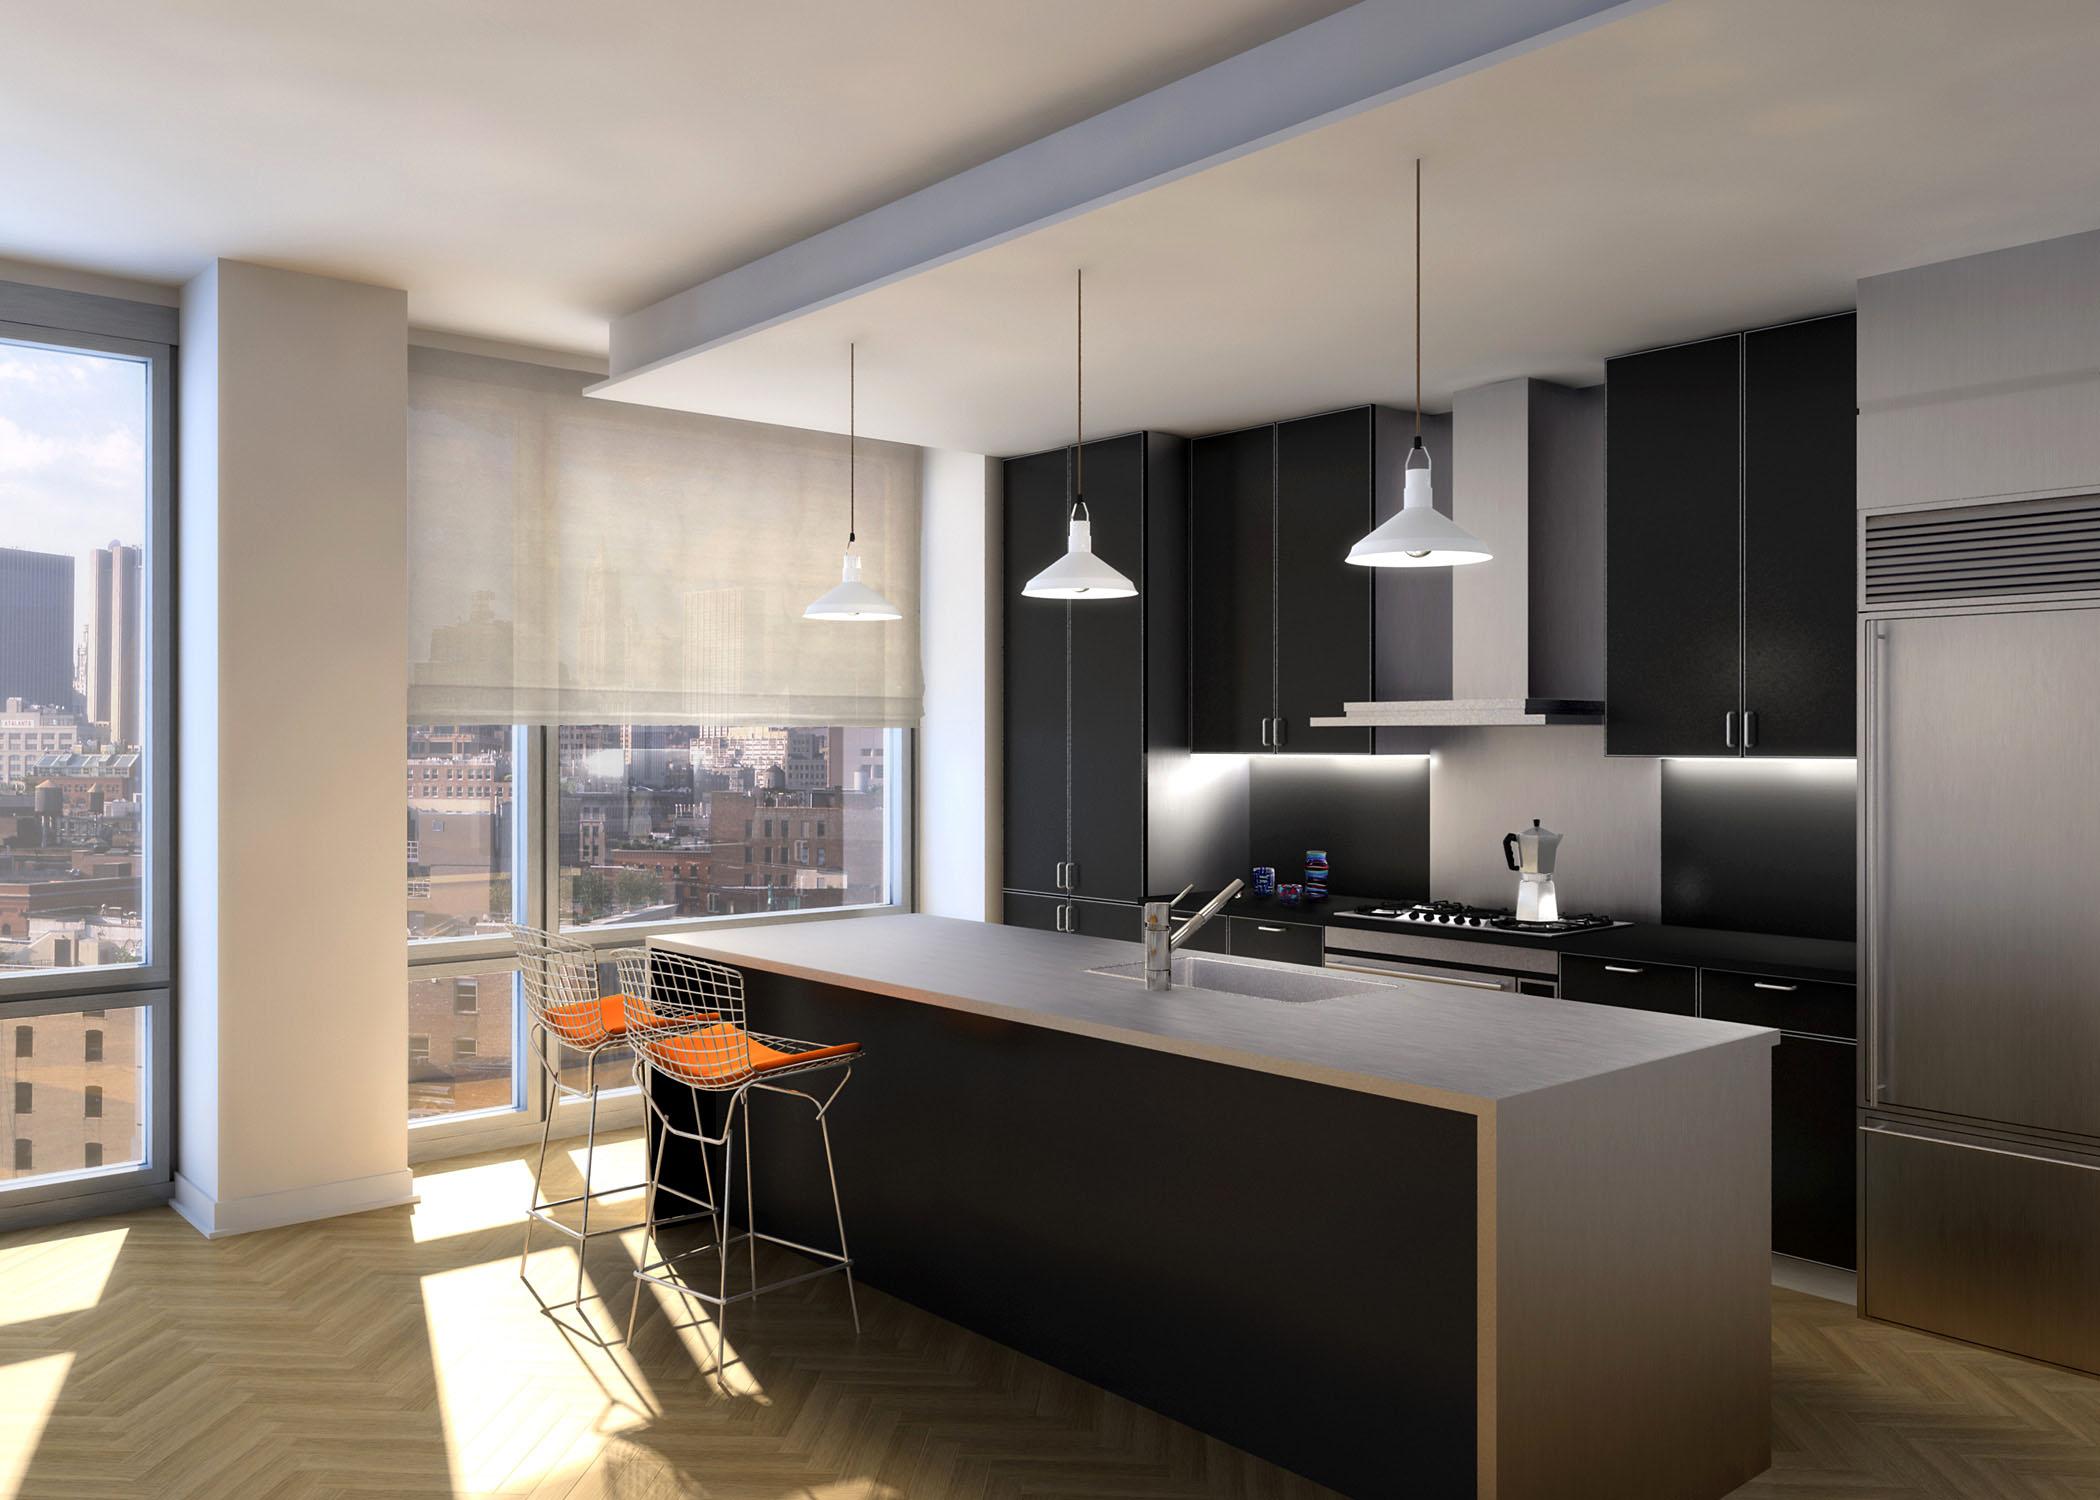 Urban Glass House - Selldorf Architects - New York